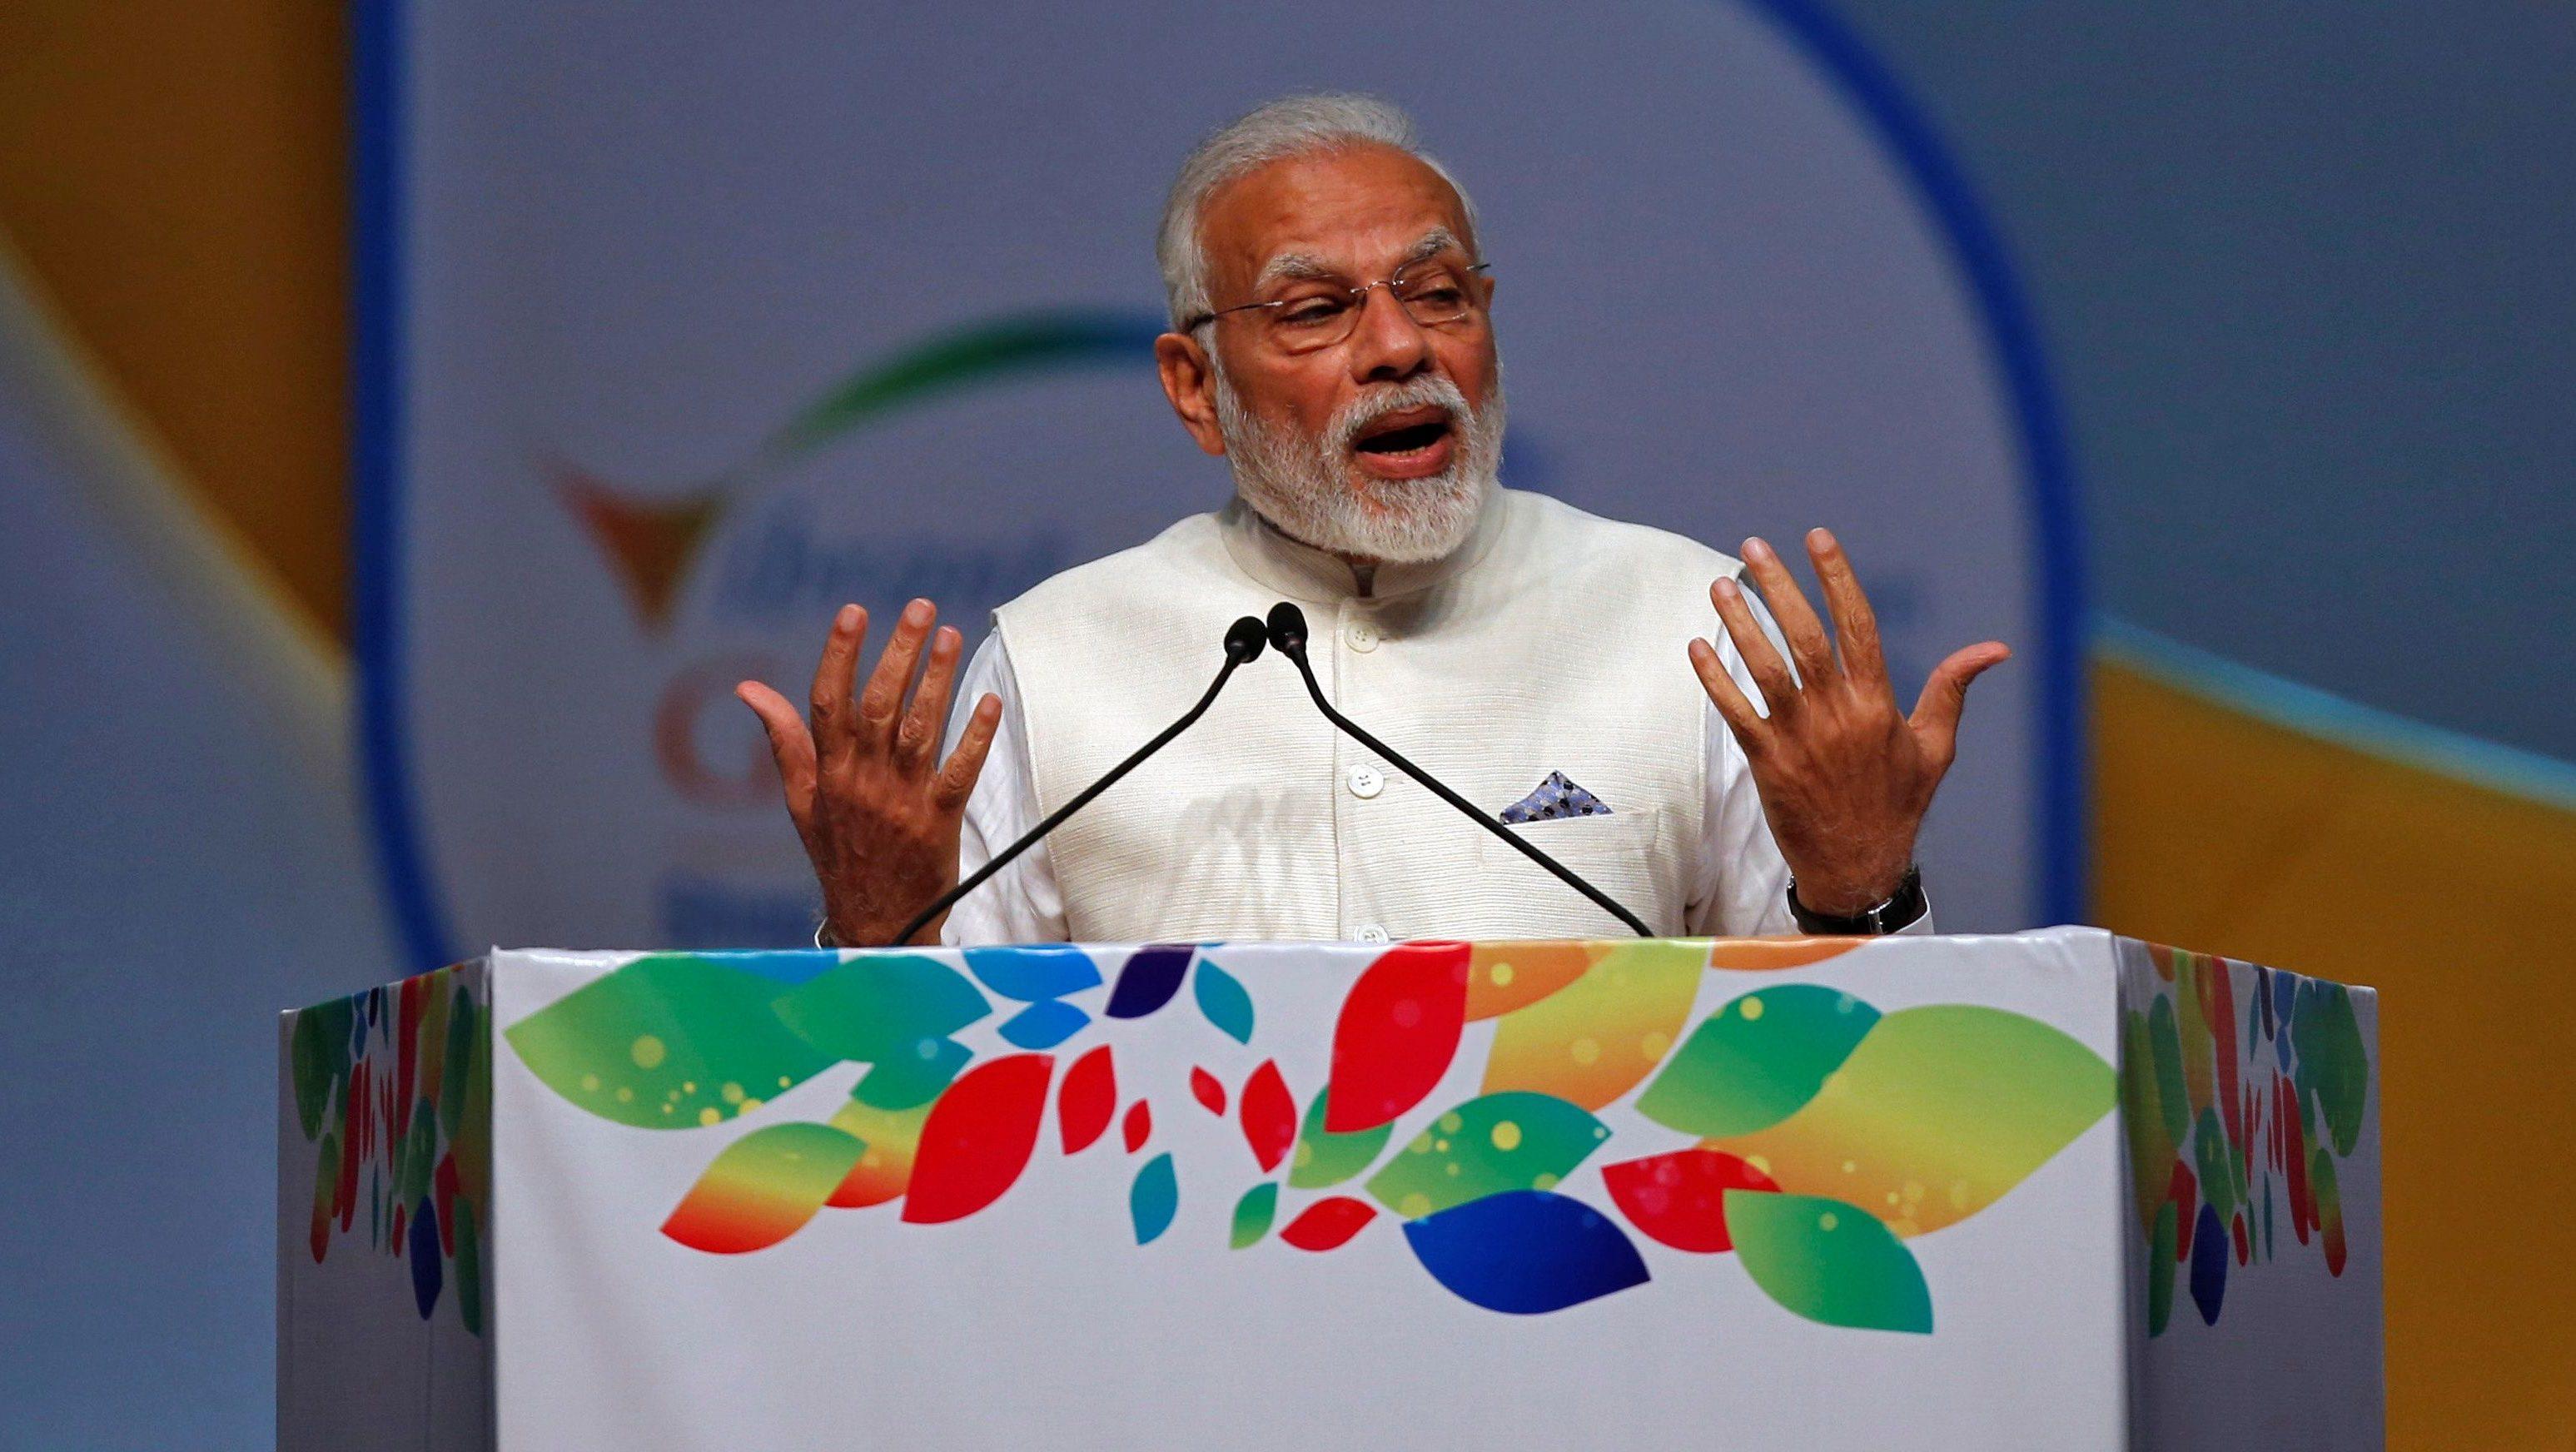 India's Prime Minister Narendra Modi speaks during the Vibrant Gujarat Global Summit in Gandhinagar